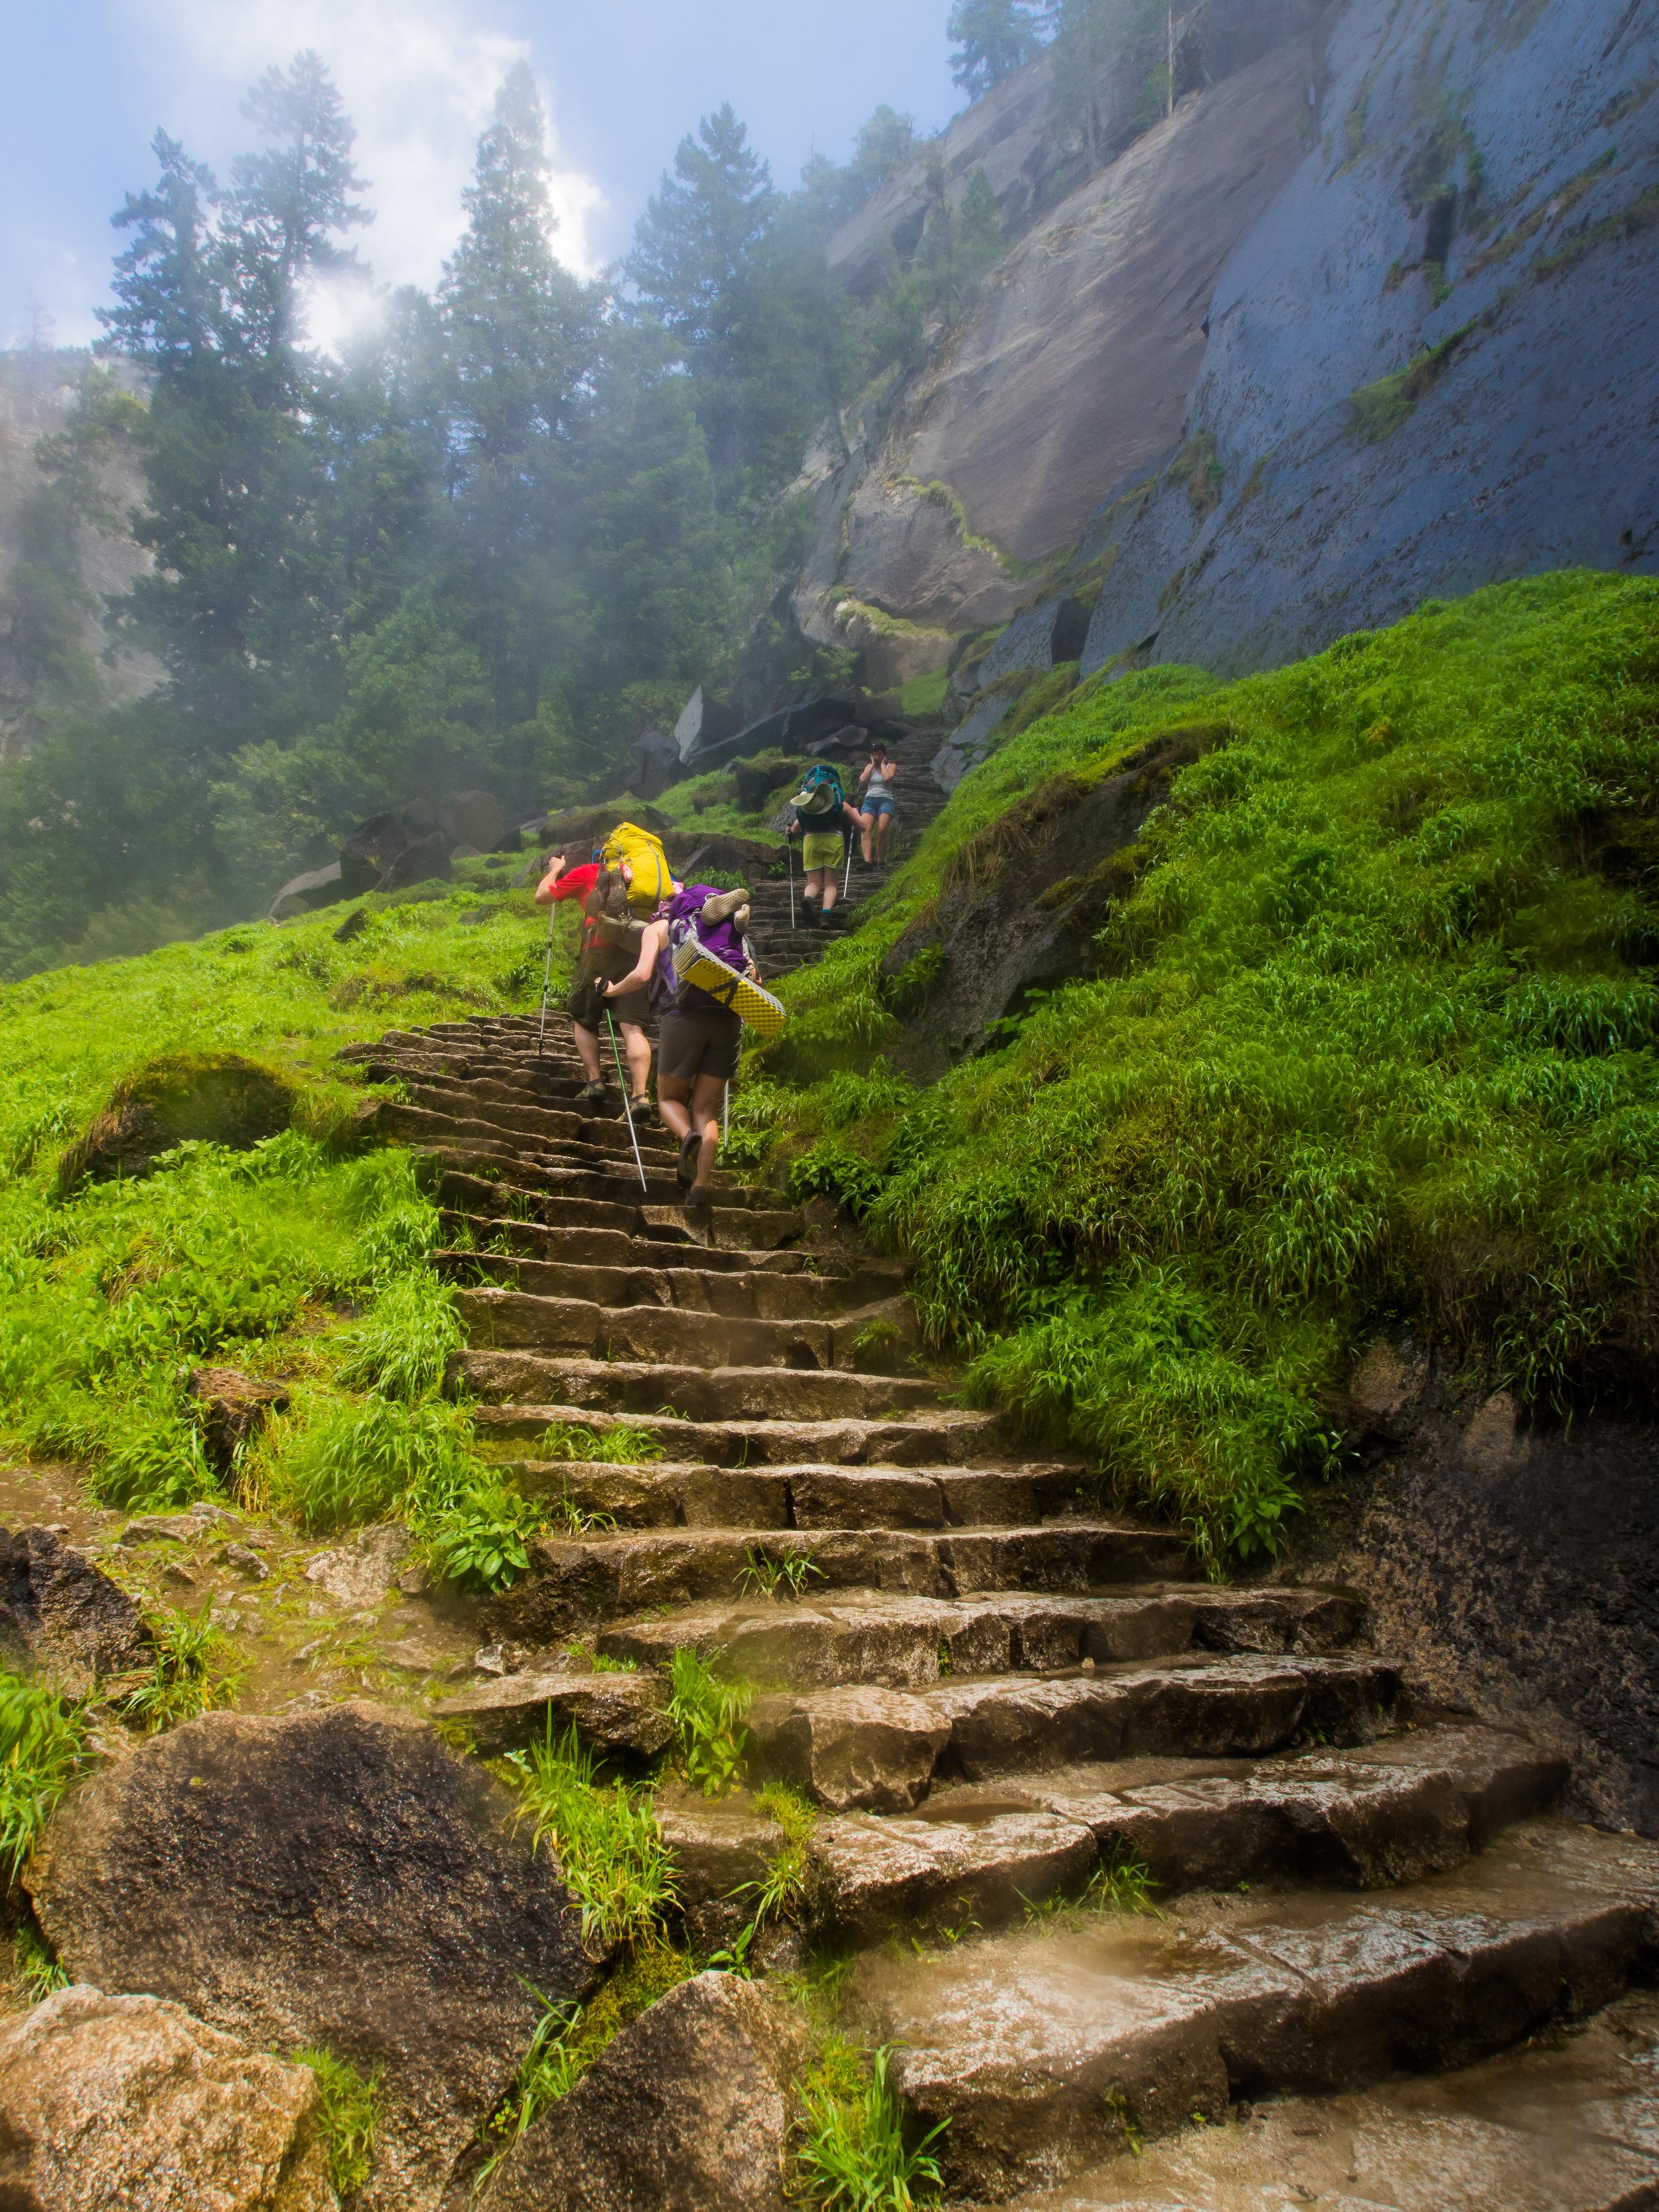 The Mist Trail